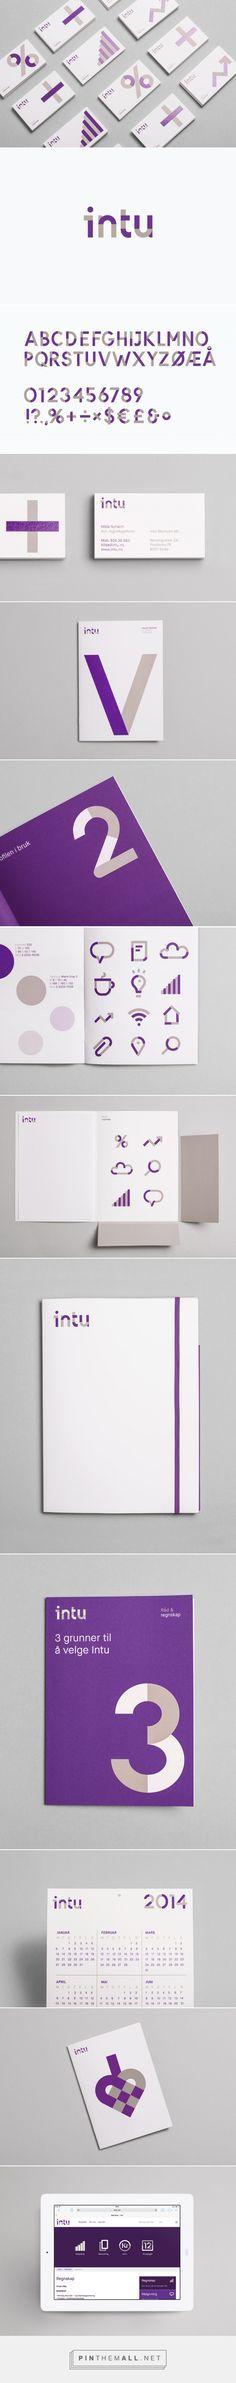 Sweet online marketing agency business card! http://arcreactions.com/services/brand-development/?utm_content=buffere82bf&utm_medium=social&utm_source=pinterest.com&utm_campaign=buffer